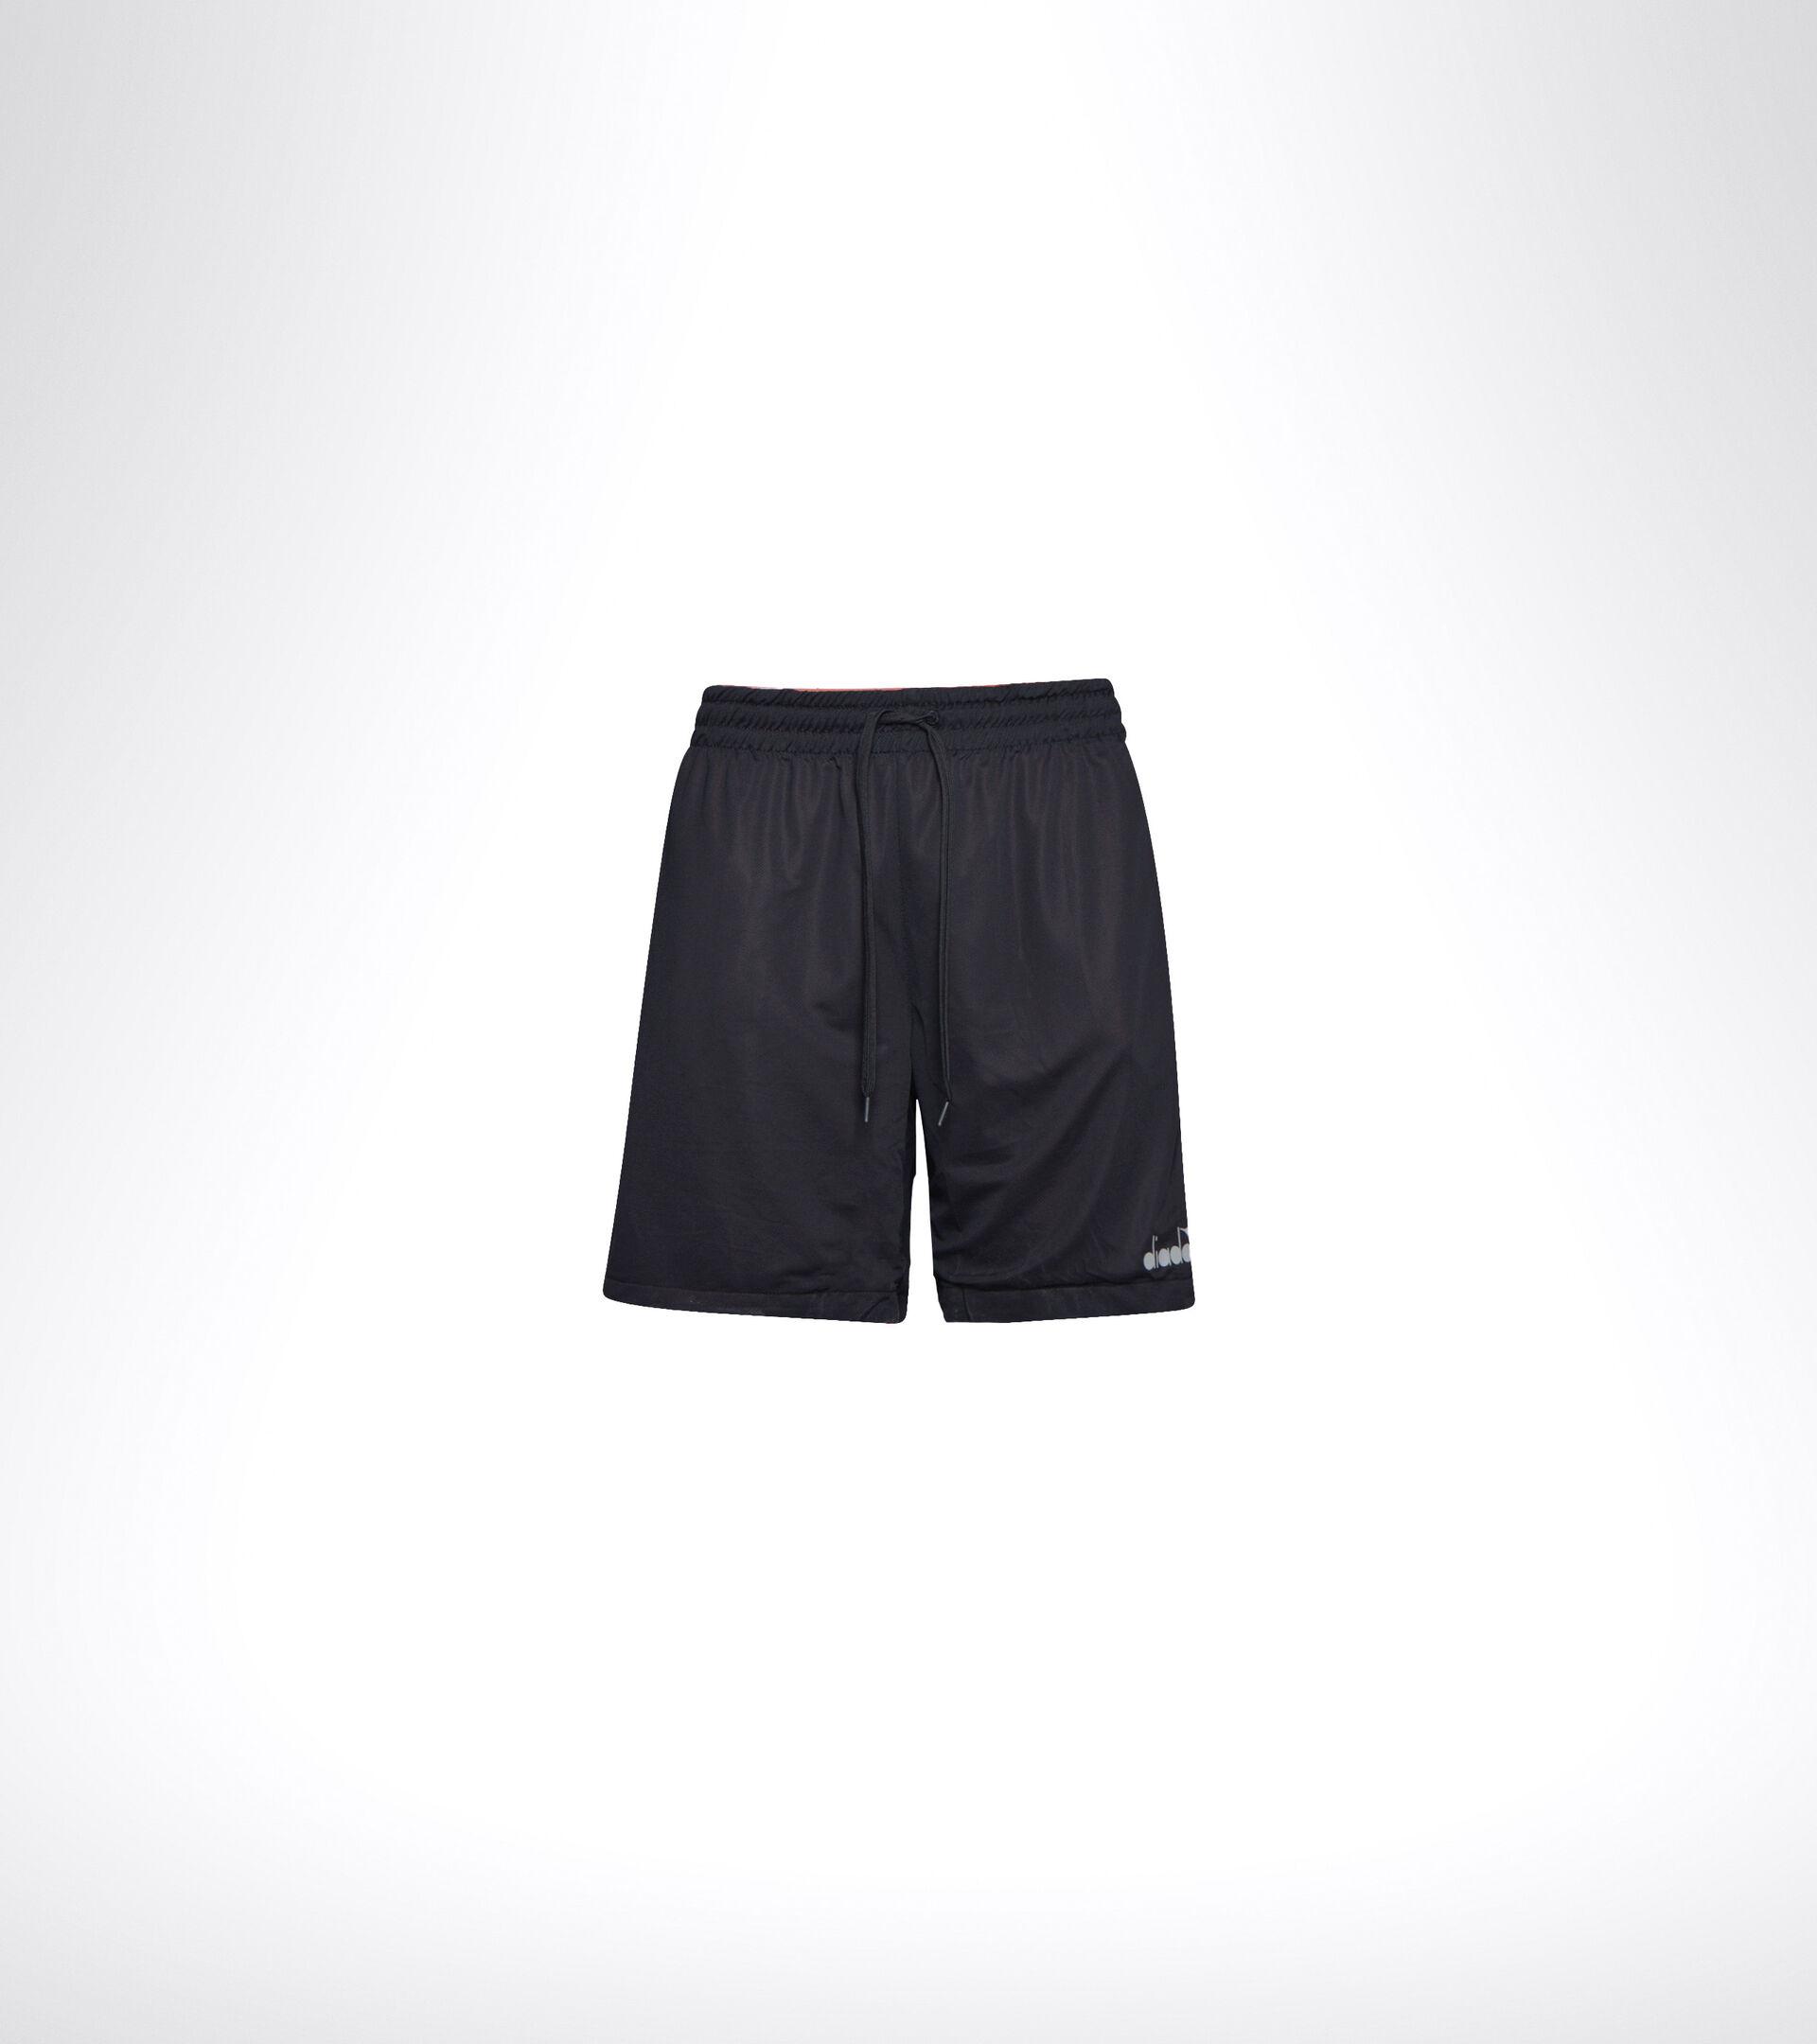 Double-face running shorts - Men BERMUDA REVERSIBLE BE ONE MECCA ORANGE/BLACK - Diadora